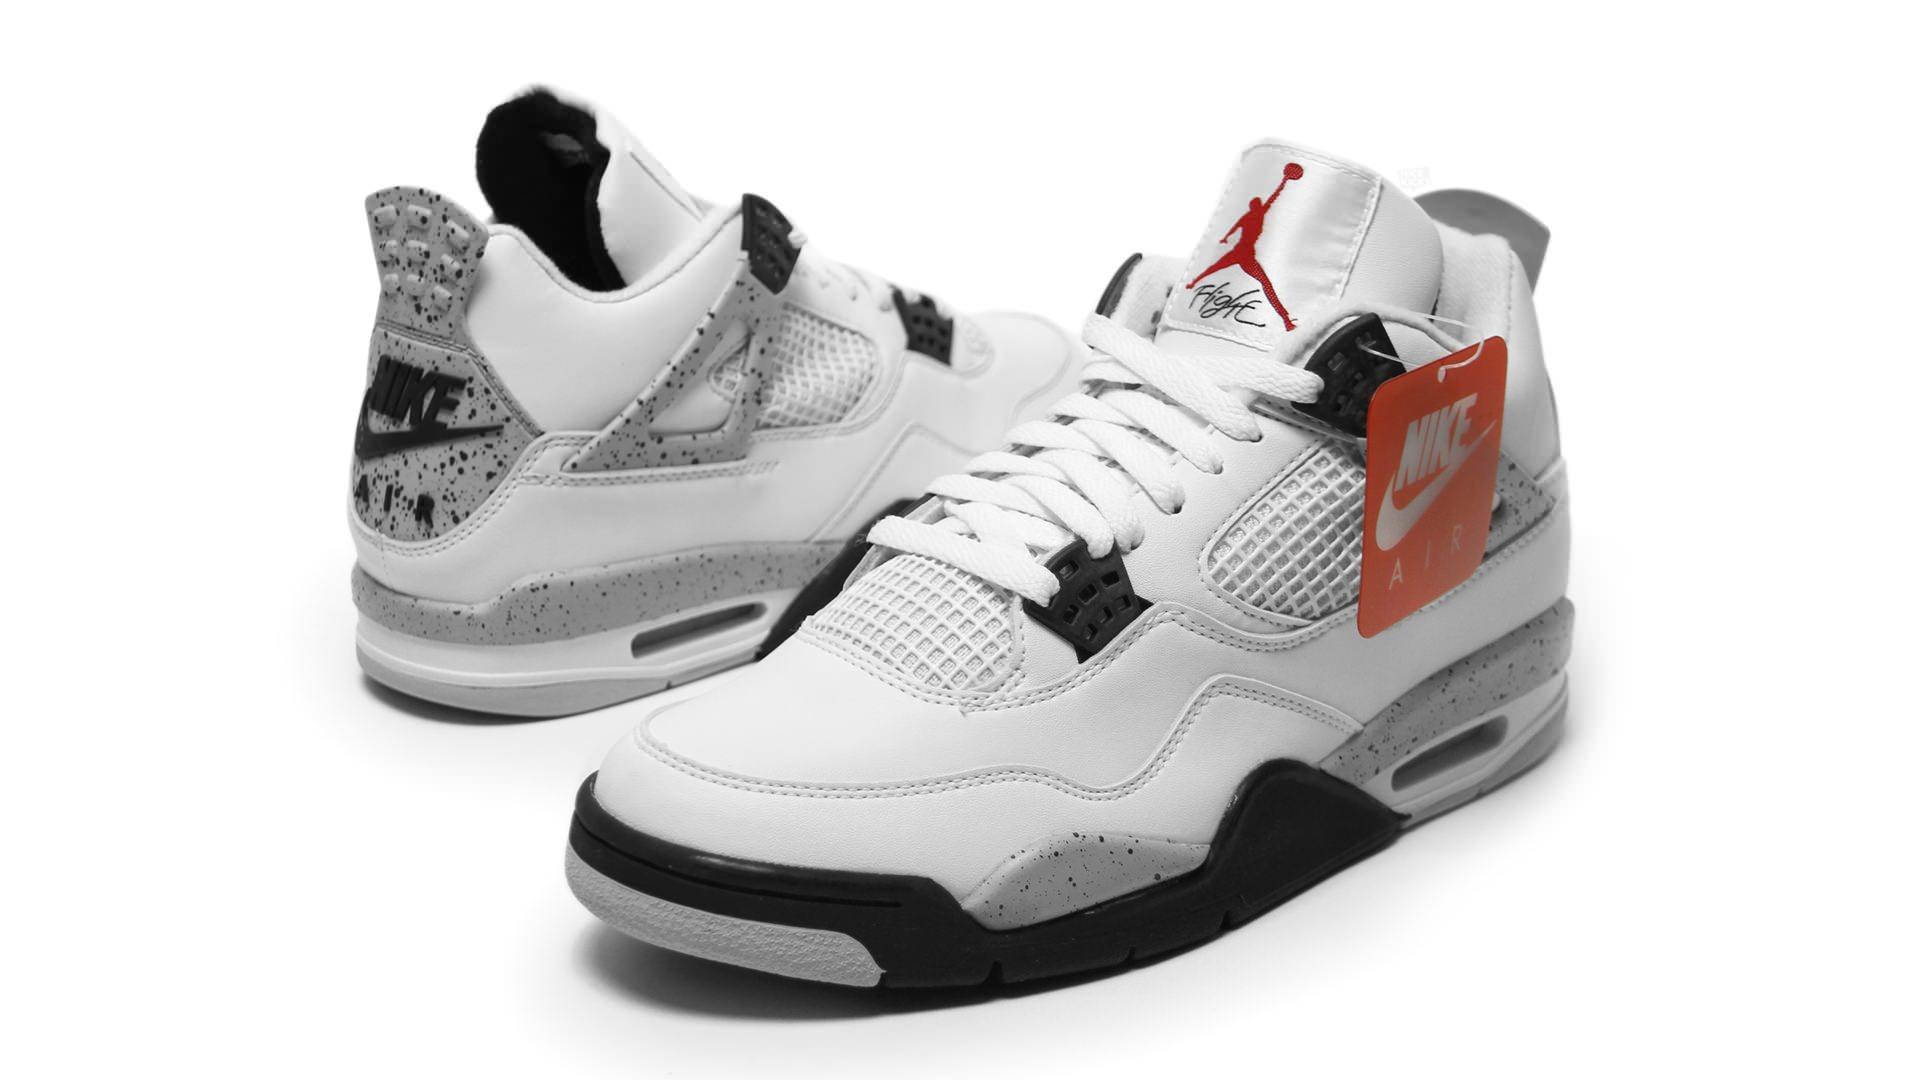 History Of Jordan Shoes